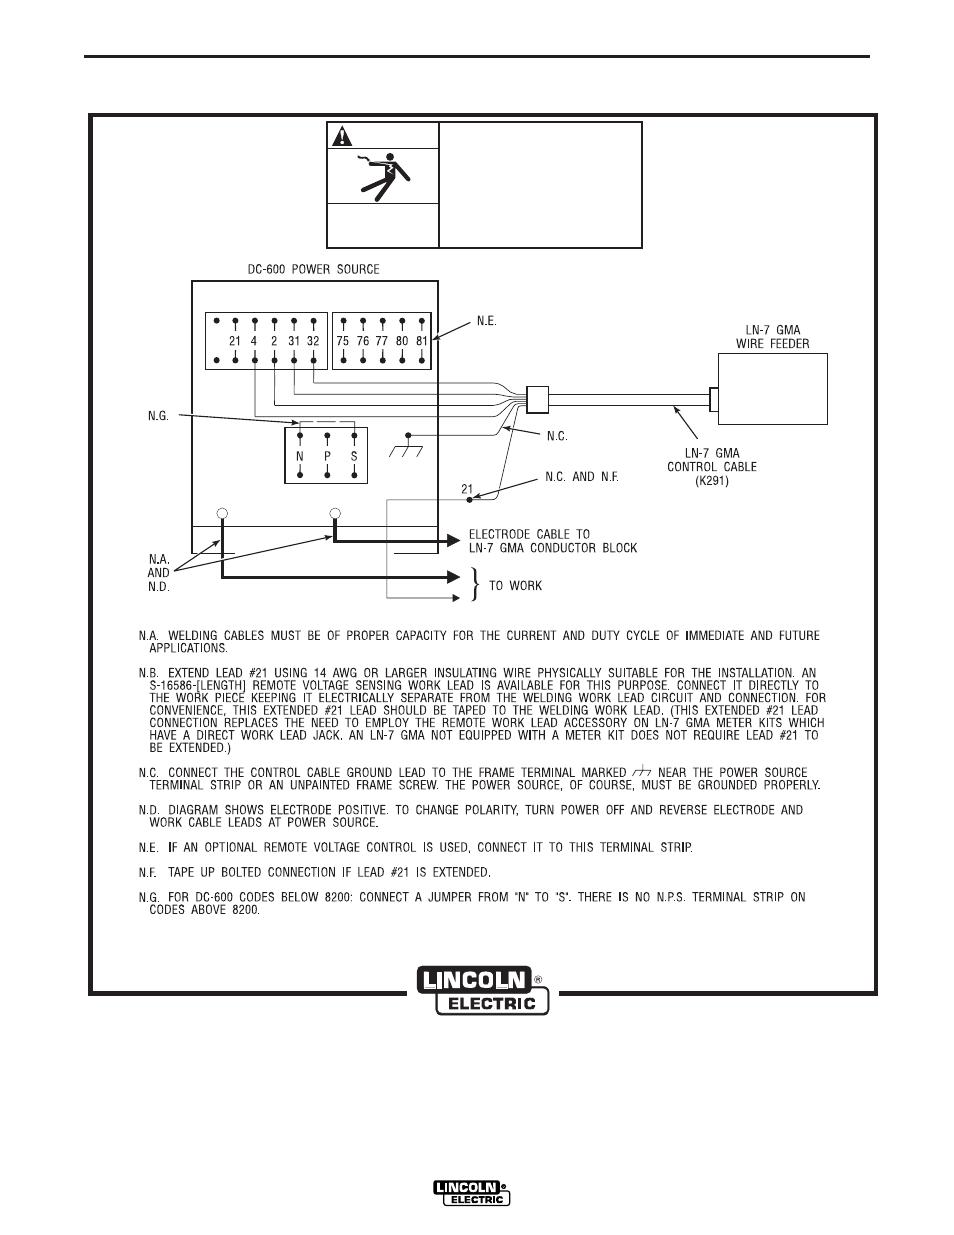 lincoln dc 600 wiring diagram - 2007 pt cruiser alternator wiring diagrams  - 2005ram.ke2x.jeanjaures37.fr  wiring diagram resource